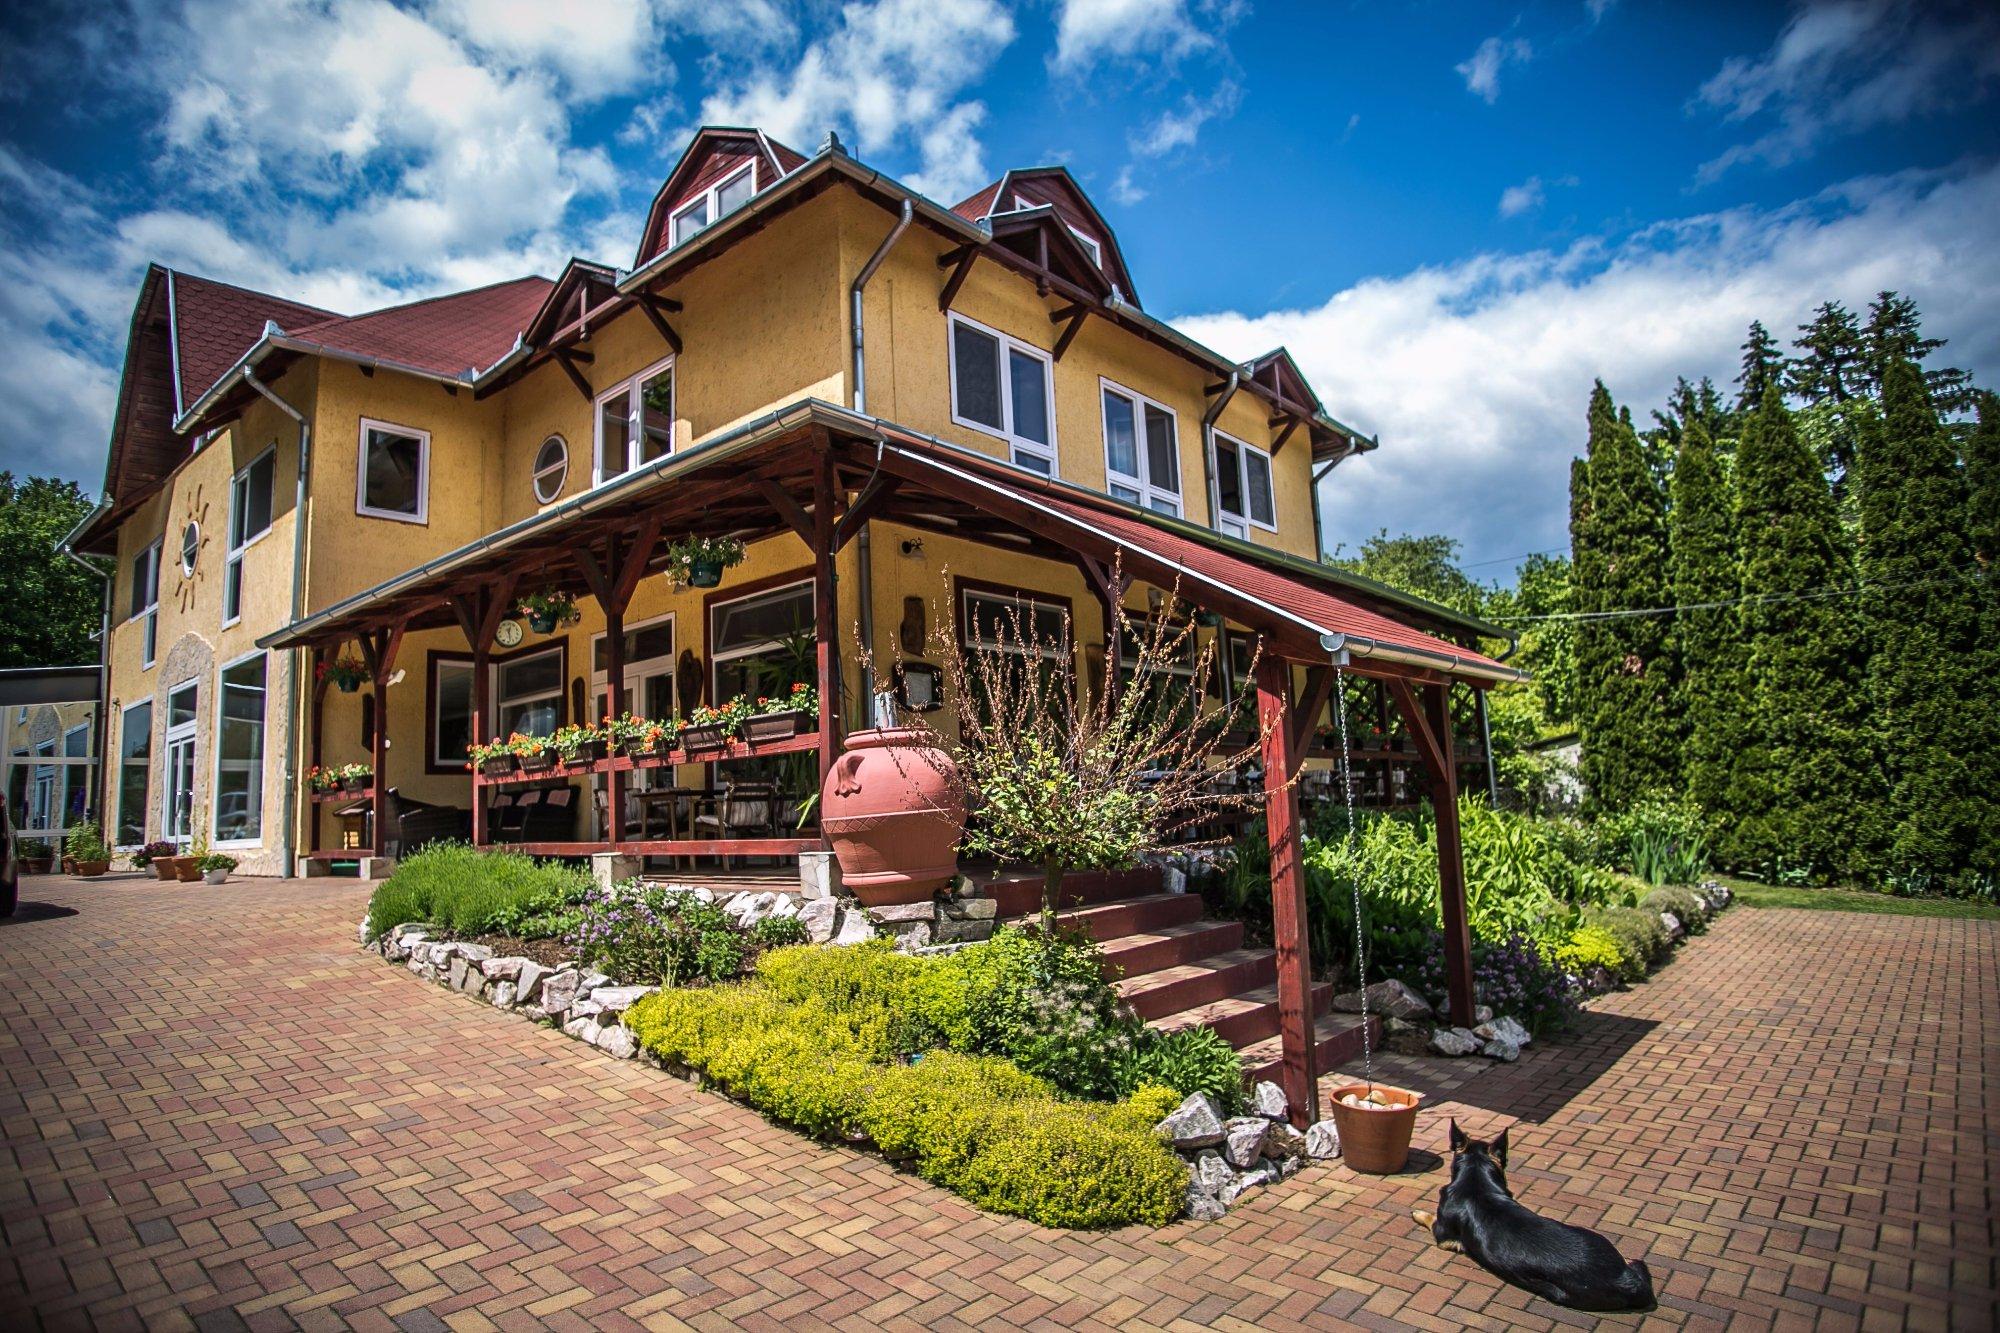 Bonne Chance Restaurant and Hotel